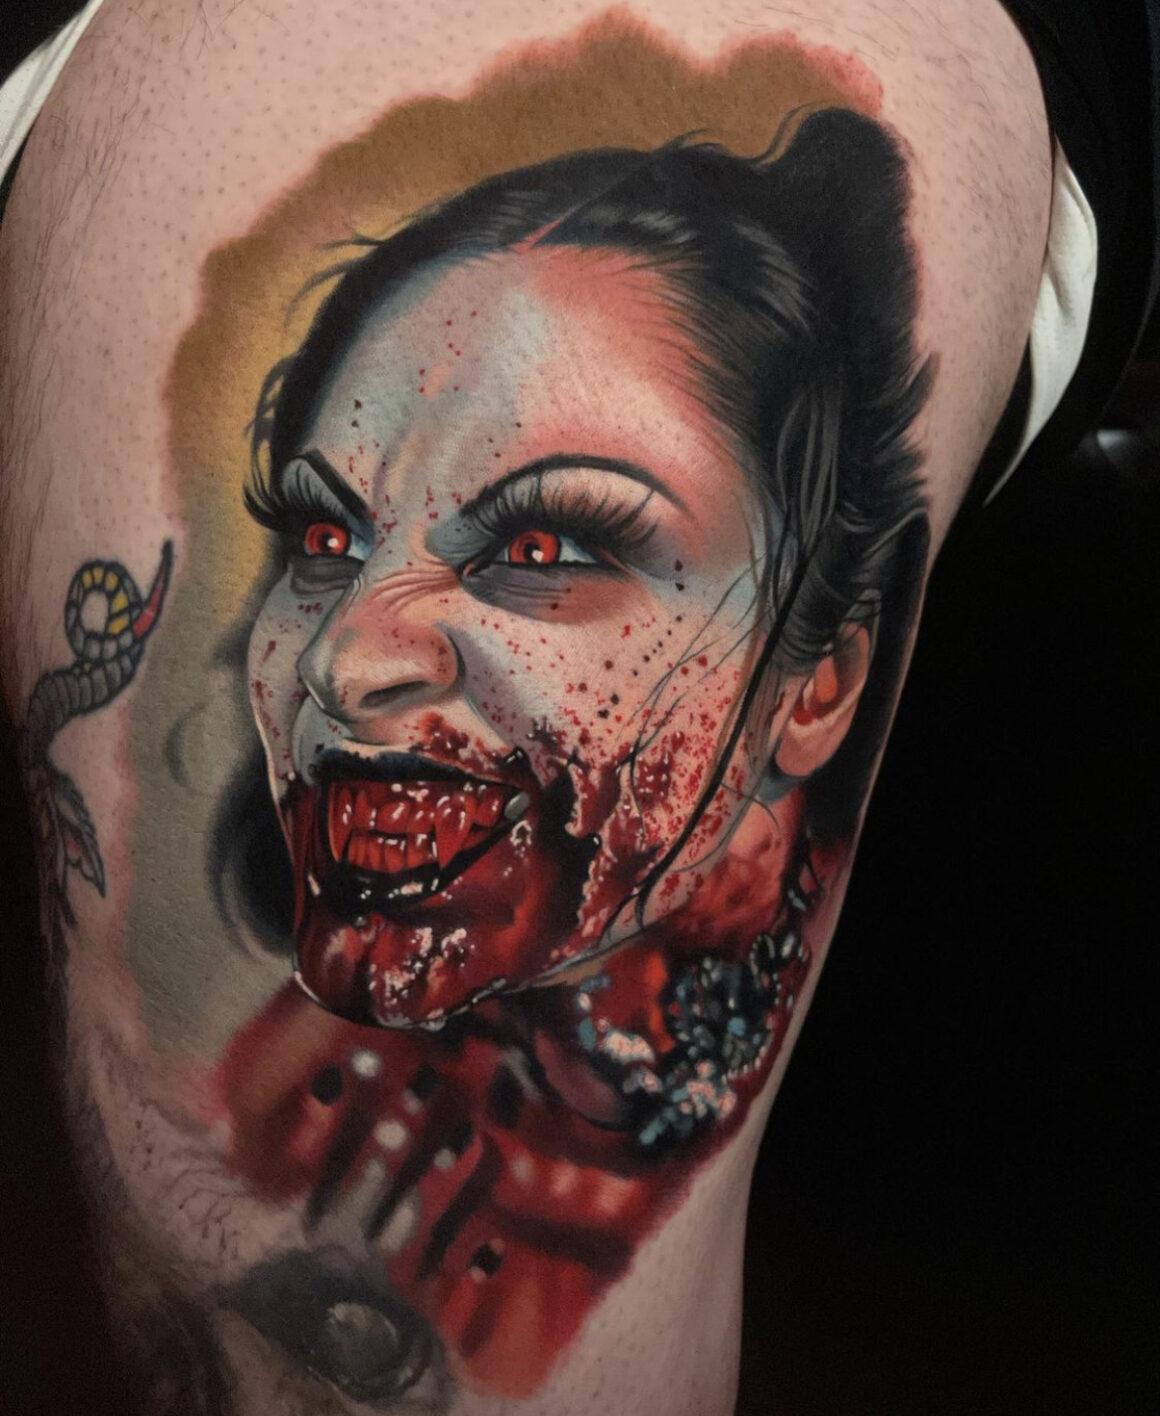 Paul Marino, Grave Tattoo Shop, North Brunswick, USA